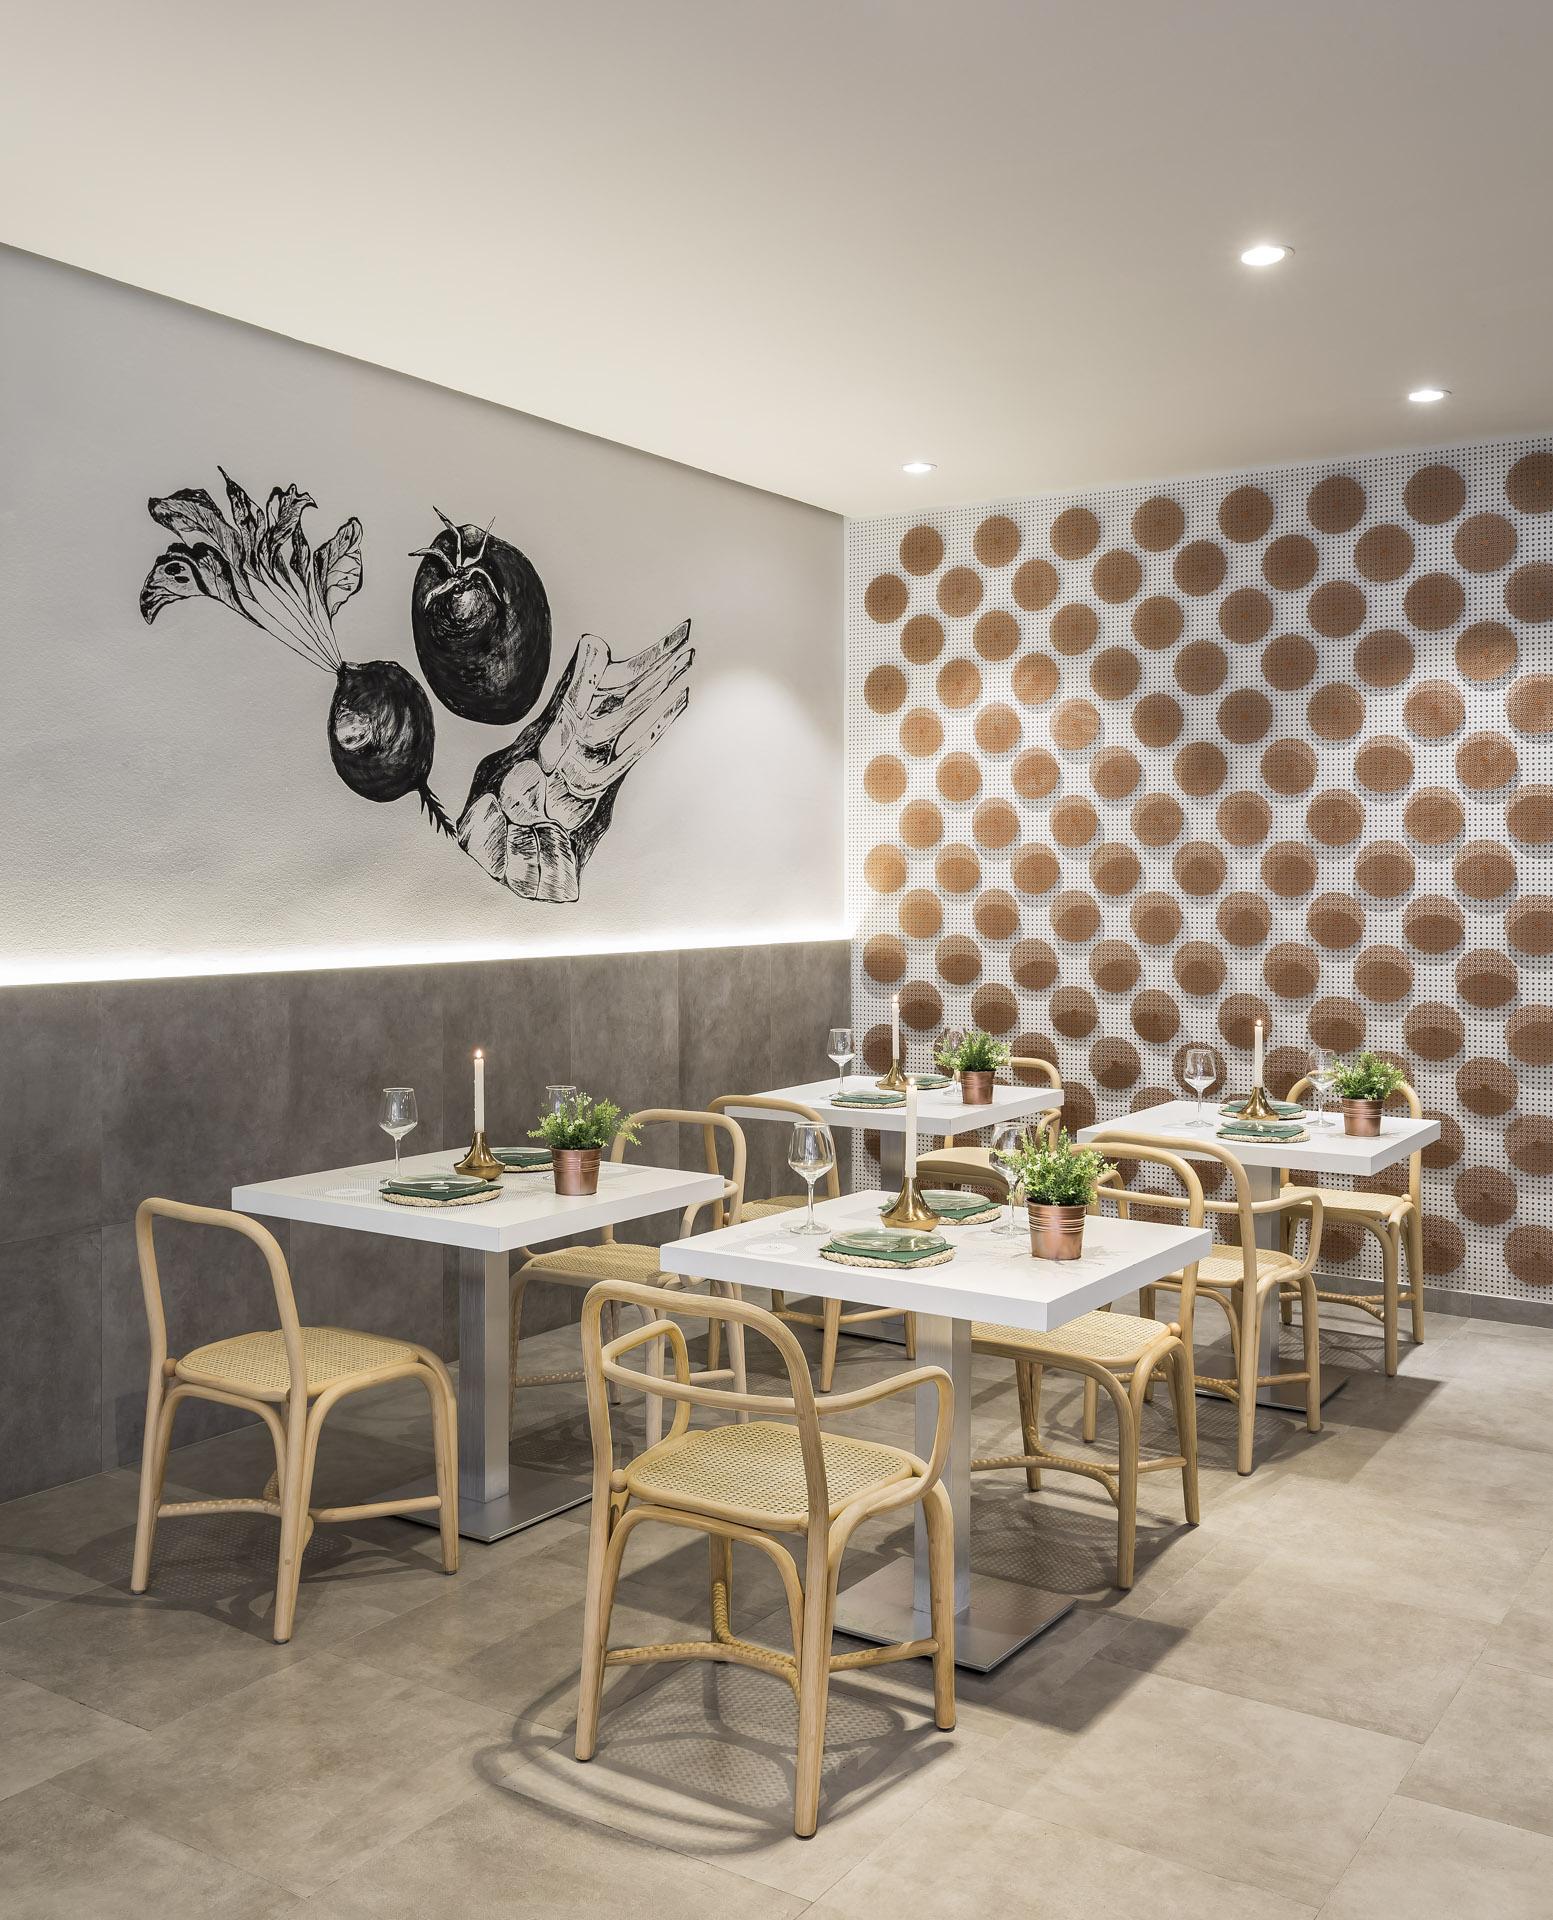 fotografia-arquitectura-valencia-german-cabo-estudihac-restaurante-nac-ontinyent-13